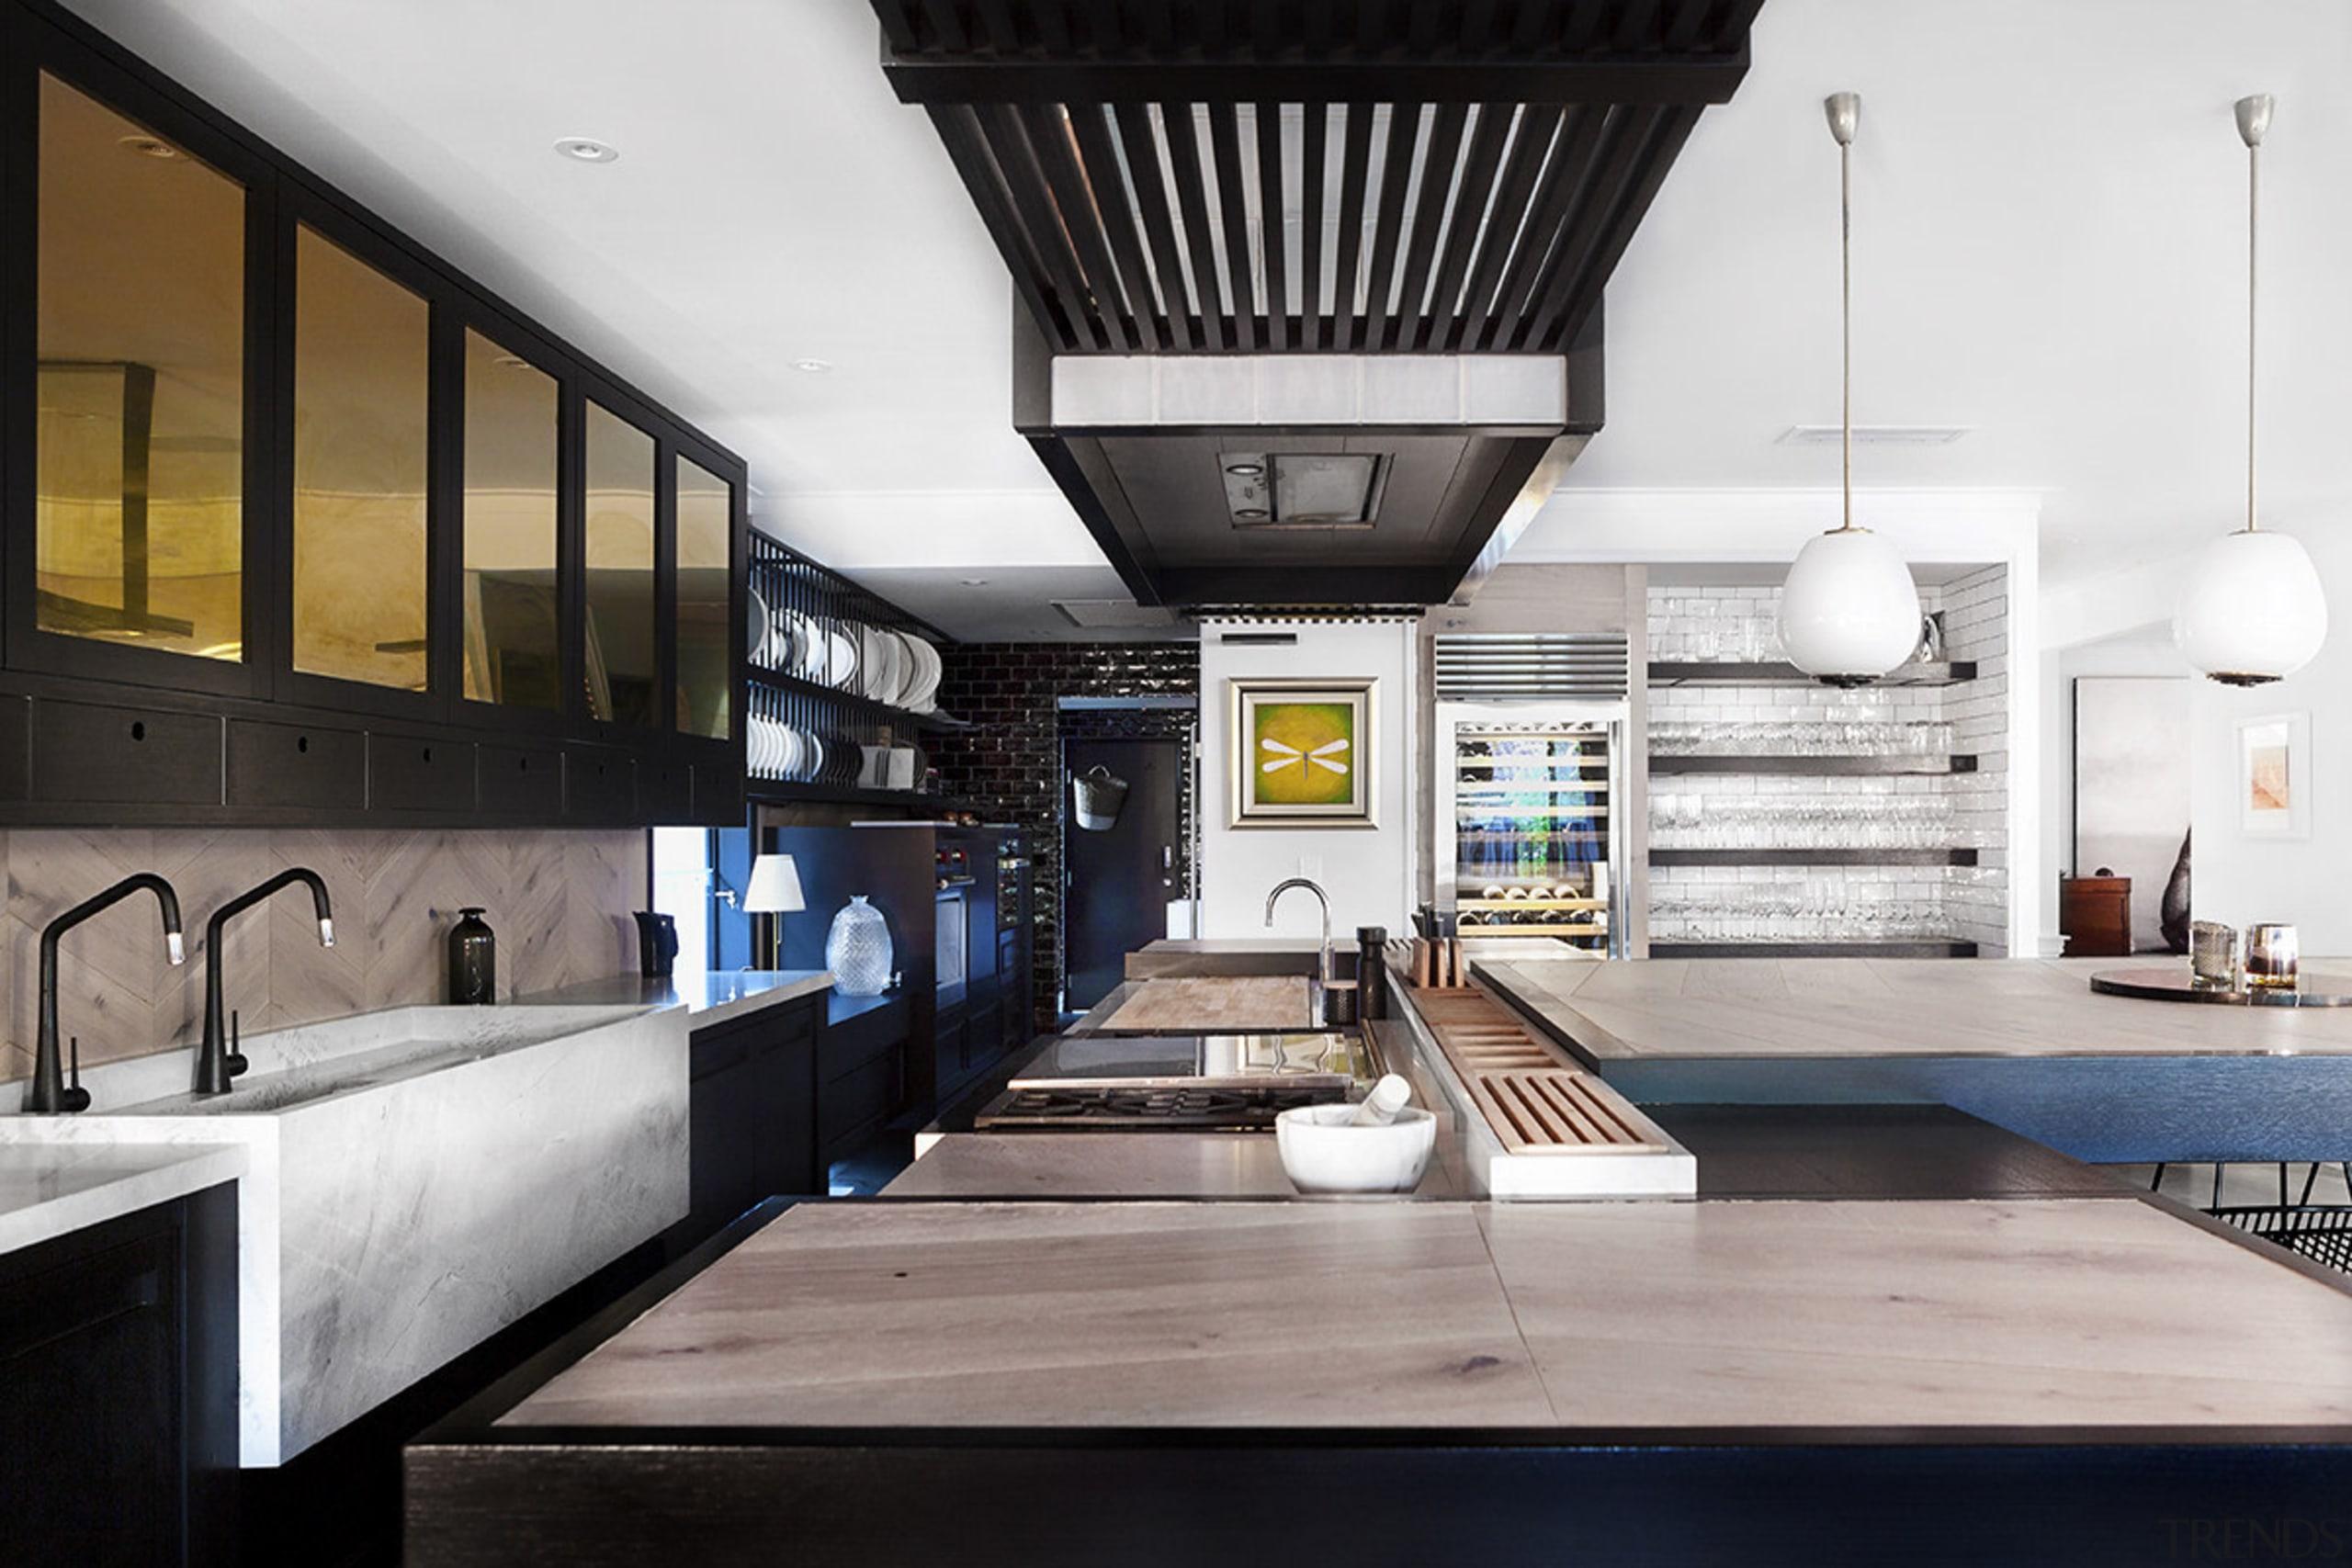 For the kitchen in his own home, designer interior design, white, black